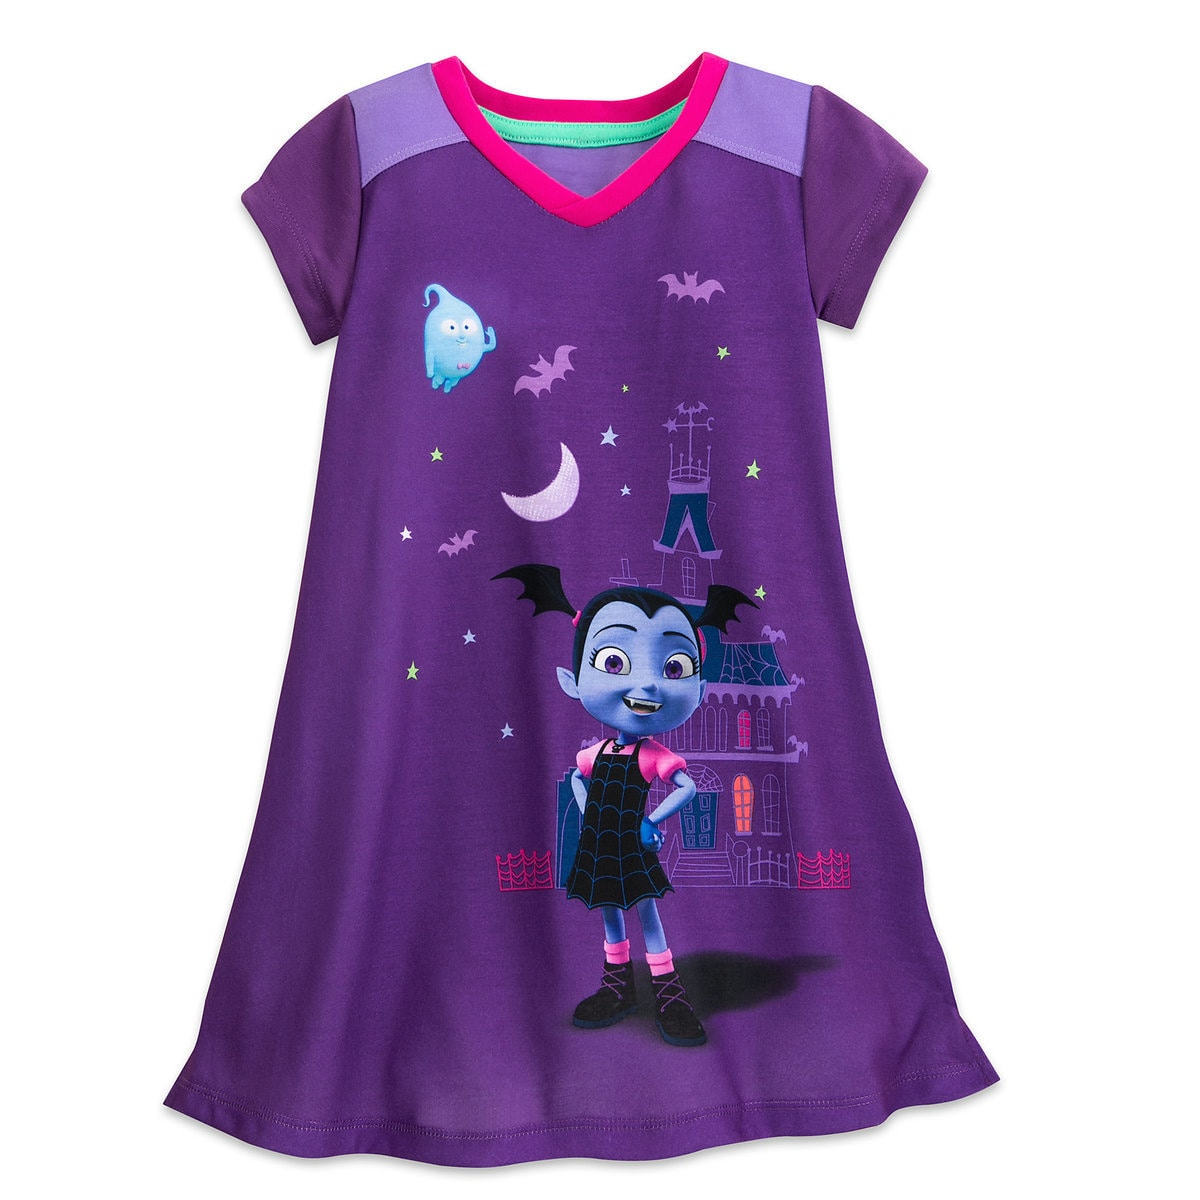 63b1730a3 Product Image of Vampirina Nightshirt for Girls # 1